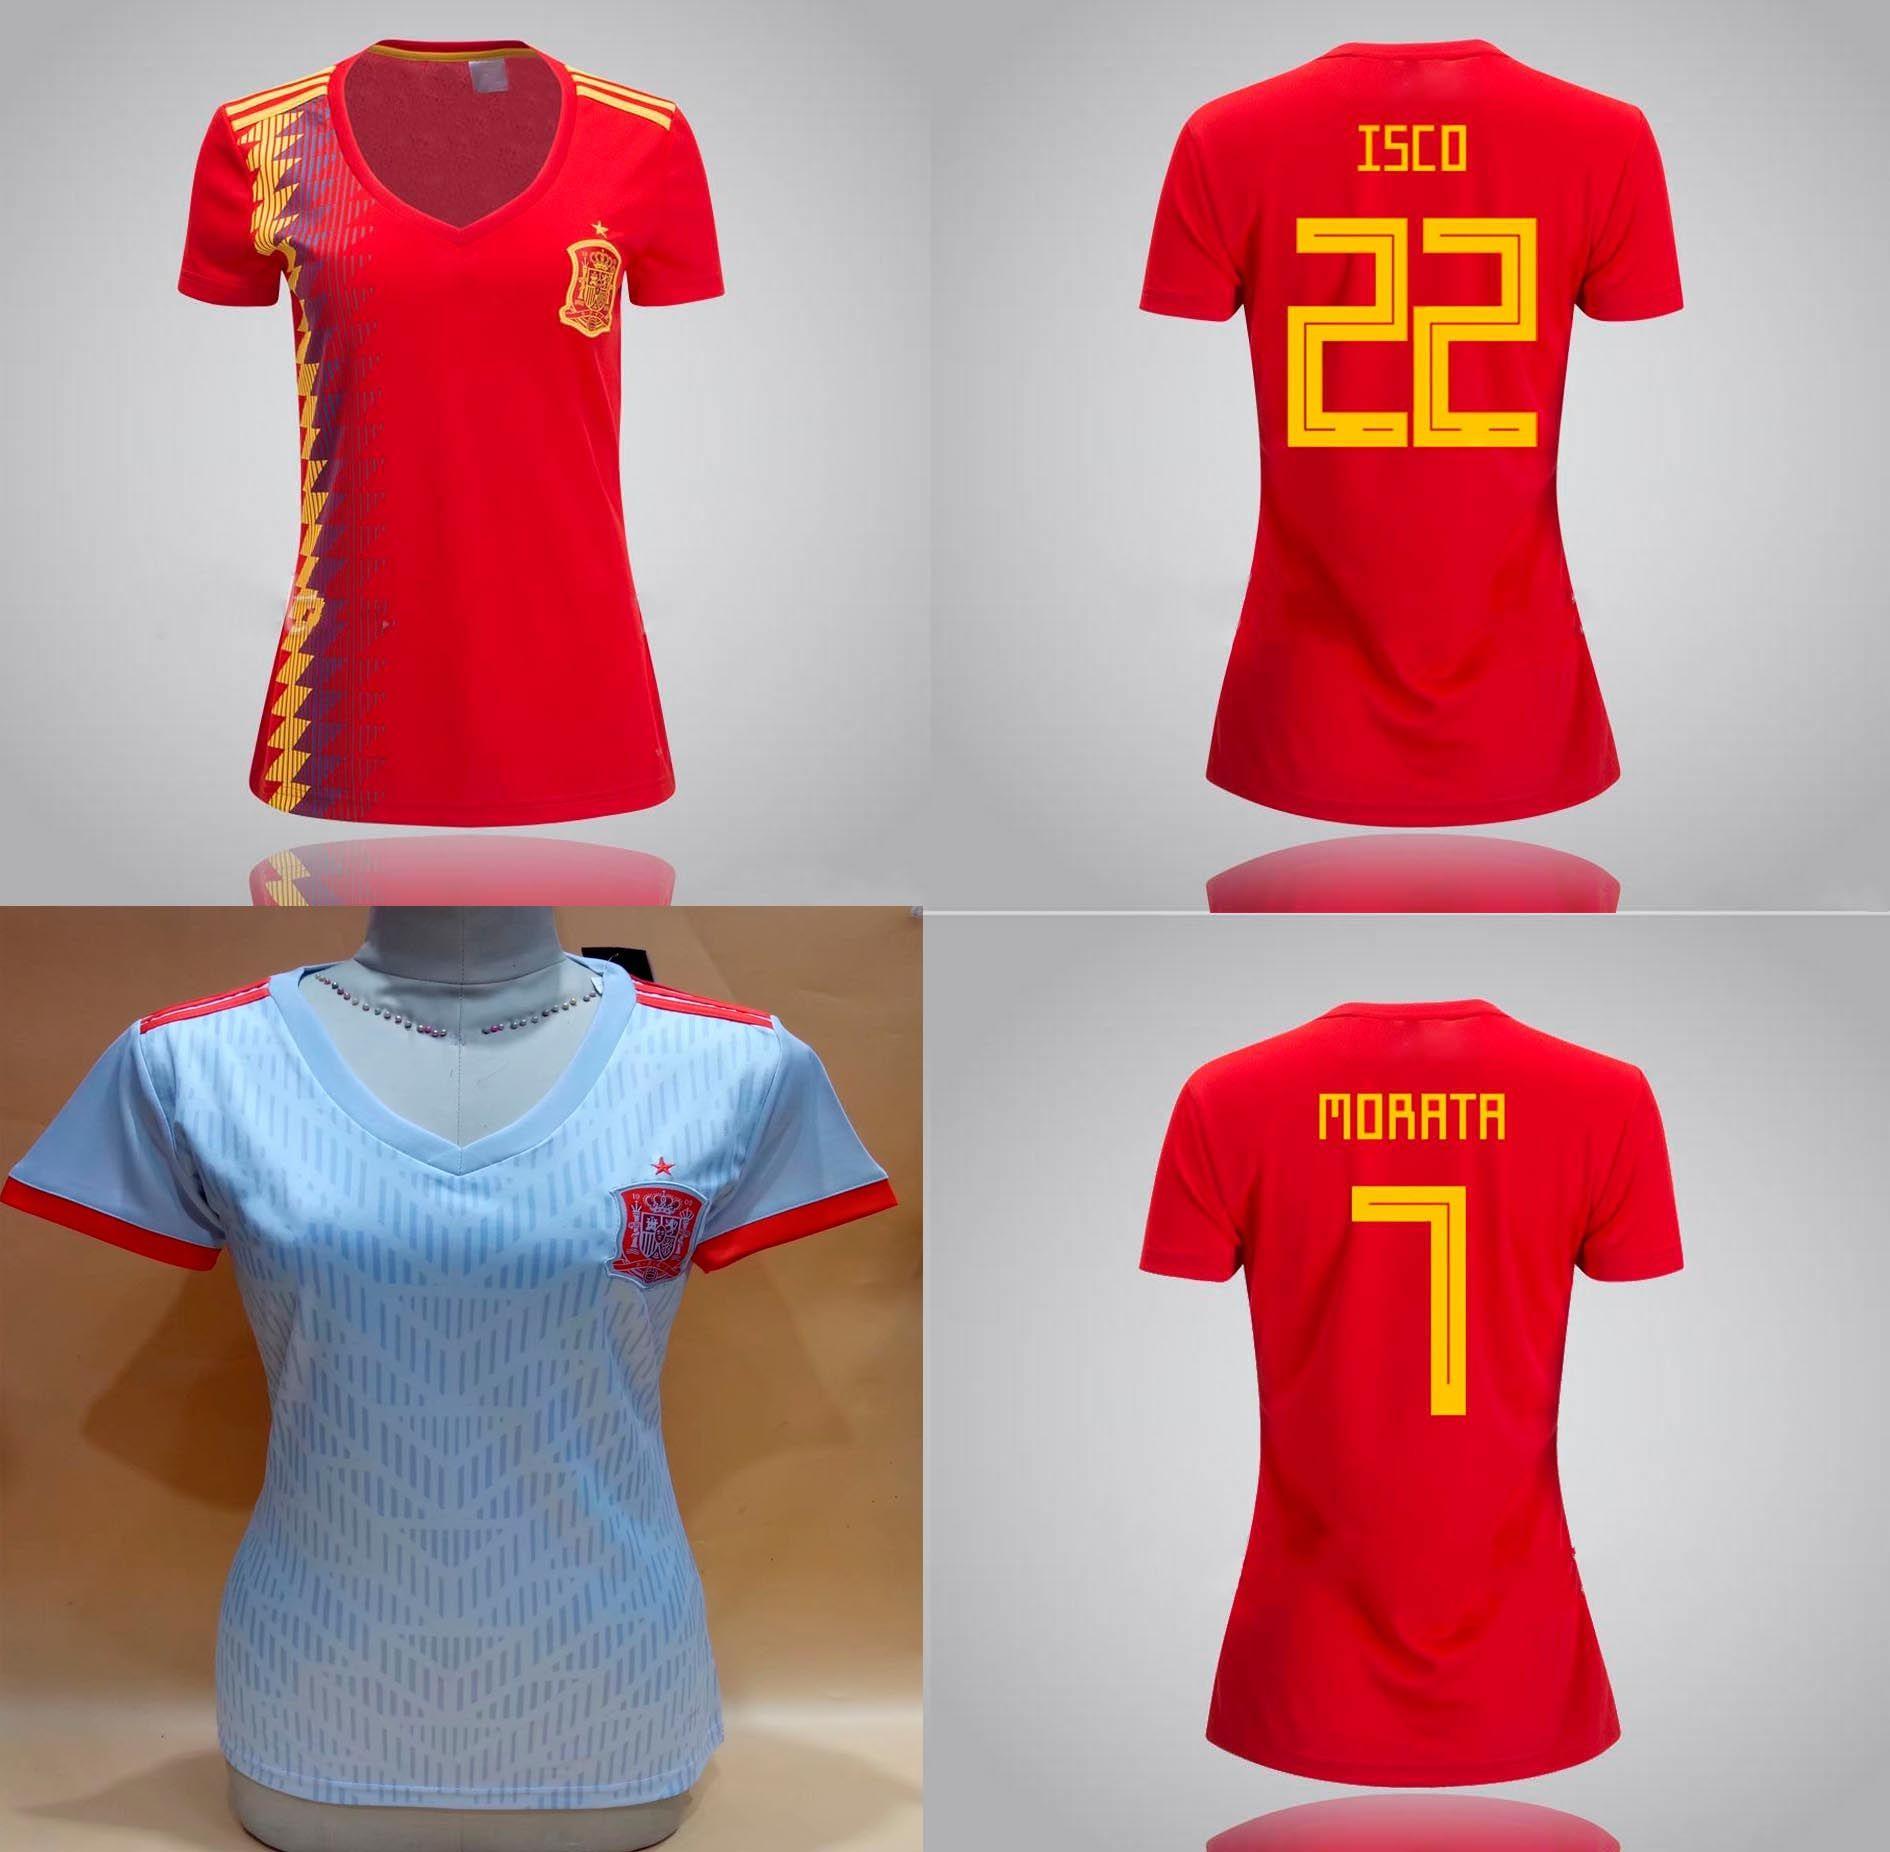 9273a6ab6 2019 Womens Spain Home Away Soccer Jerseys 18 19 Morata ISCO ASENSIO Silva  Ramos Grils Football Shirt Espana World Cup 2018 Lady Soccer Uniforms From  ...